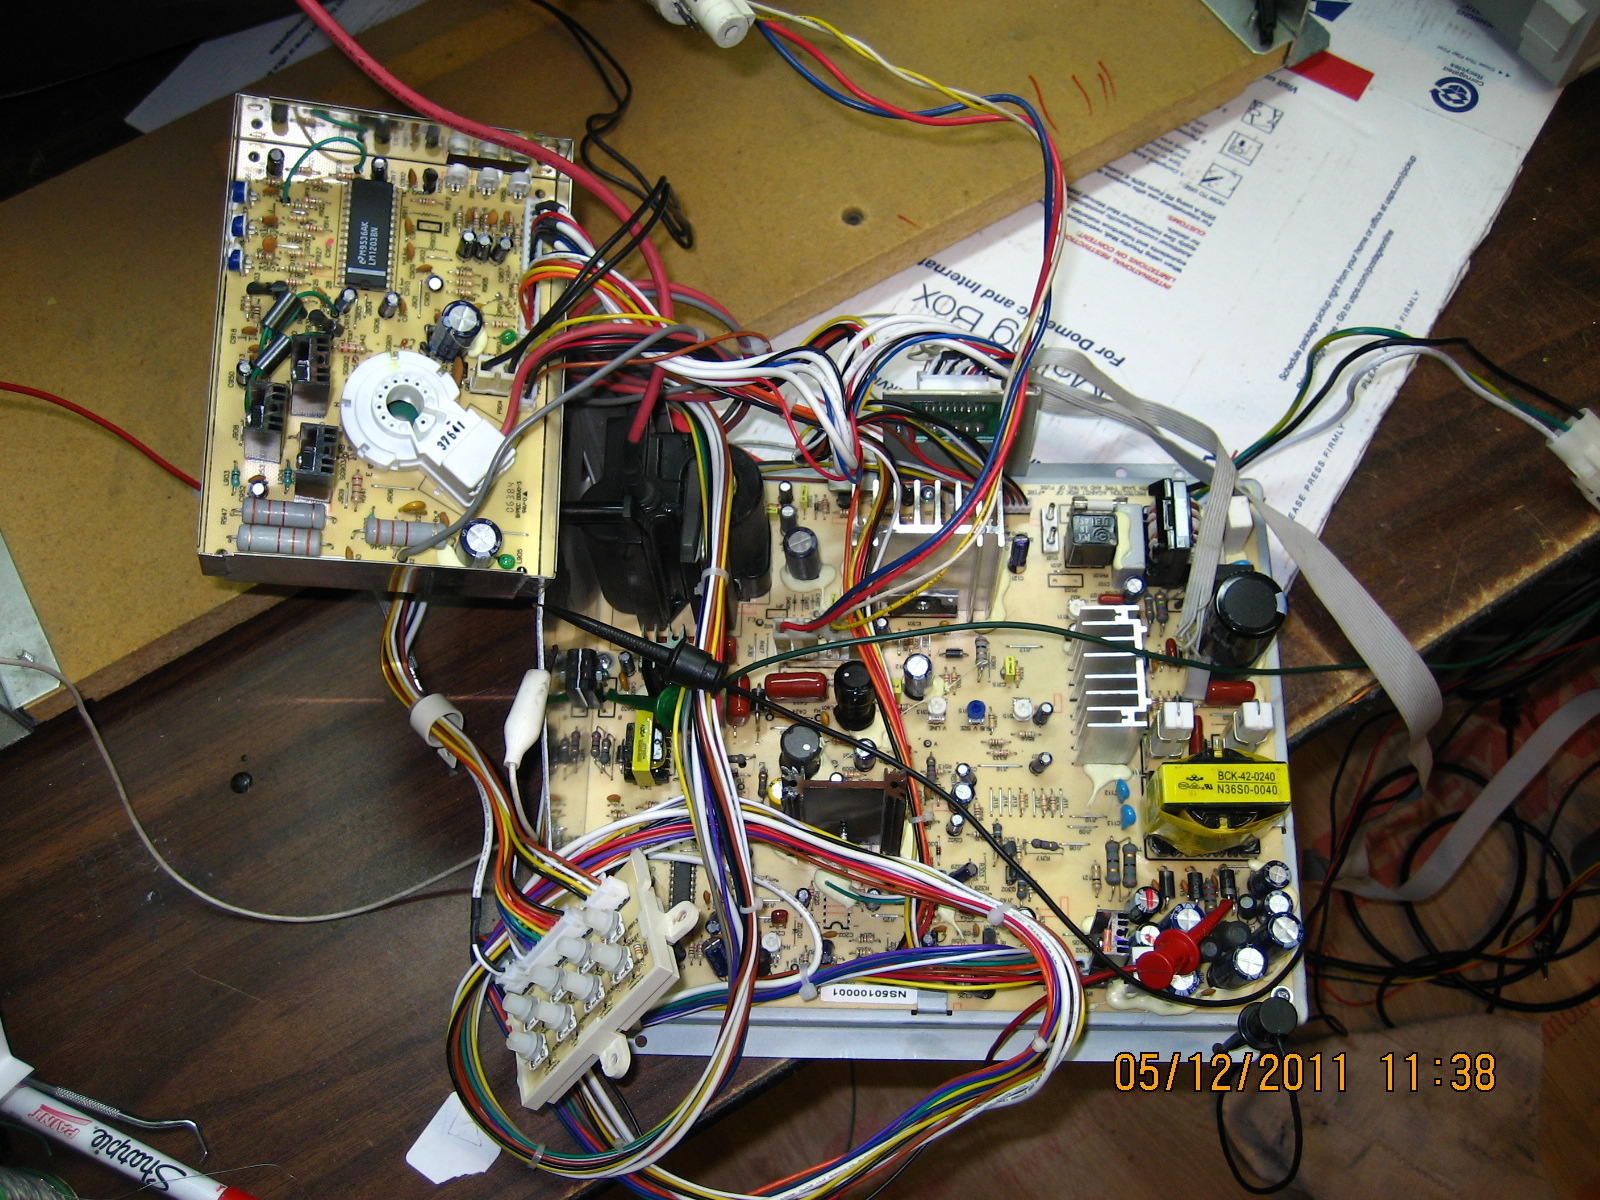 Arcadecupcom Crtlabsnet Tda1175p 8211 Low Noise Tv Vertical Deflection System Nt